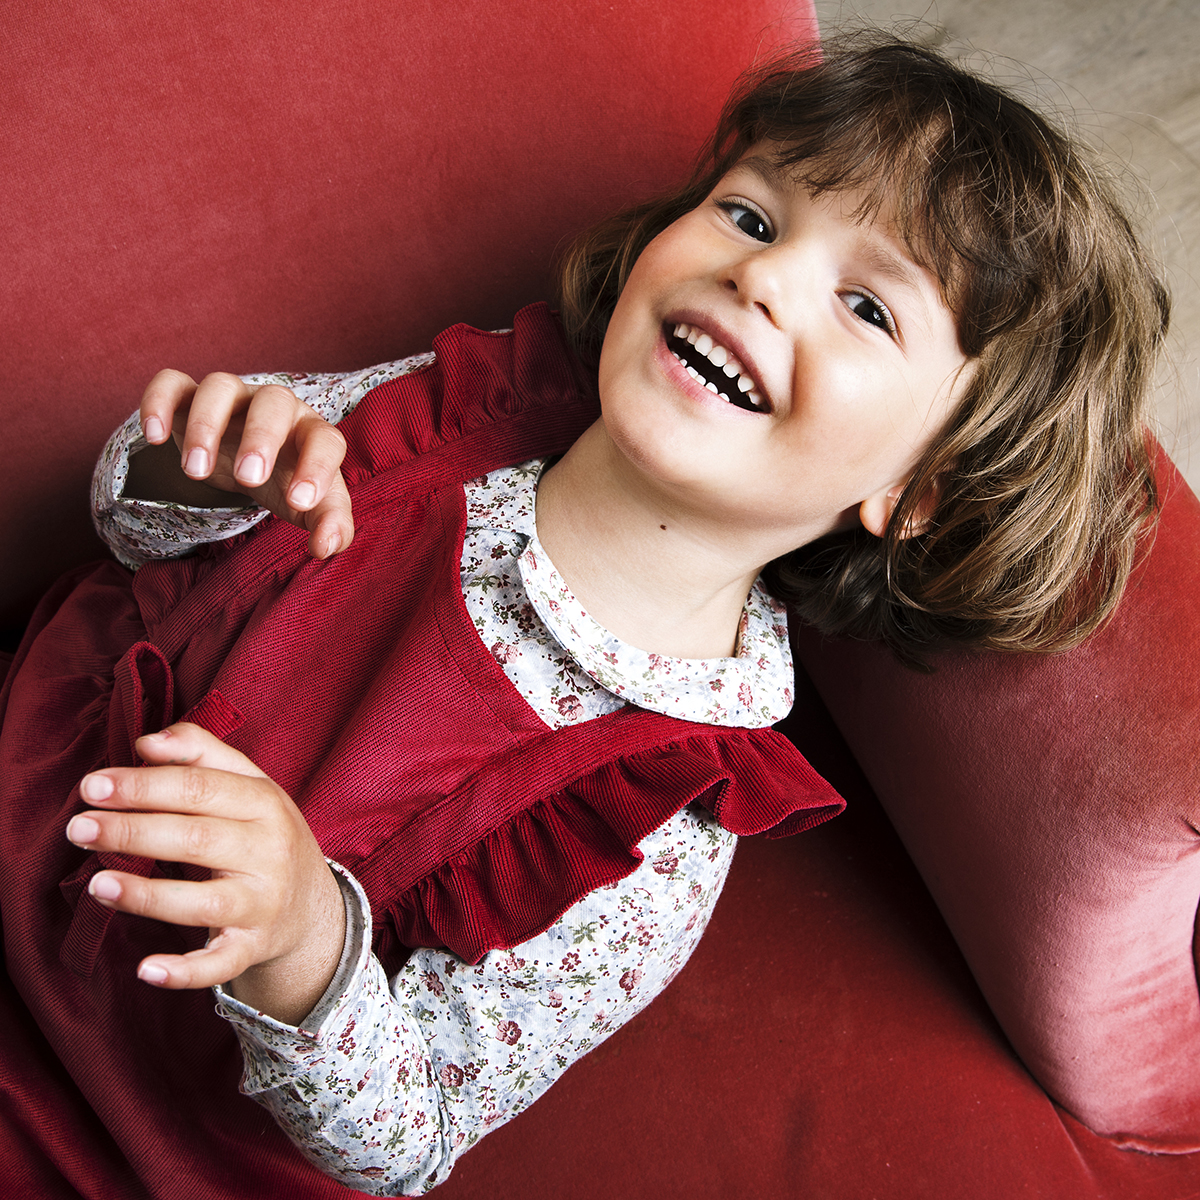 blouse_fille_robe_rouge_velours-1